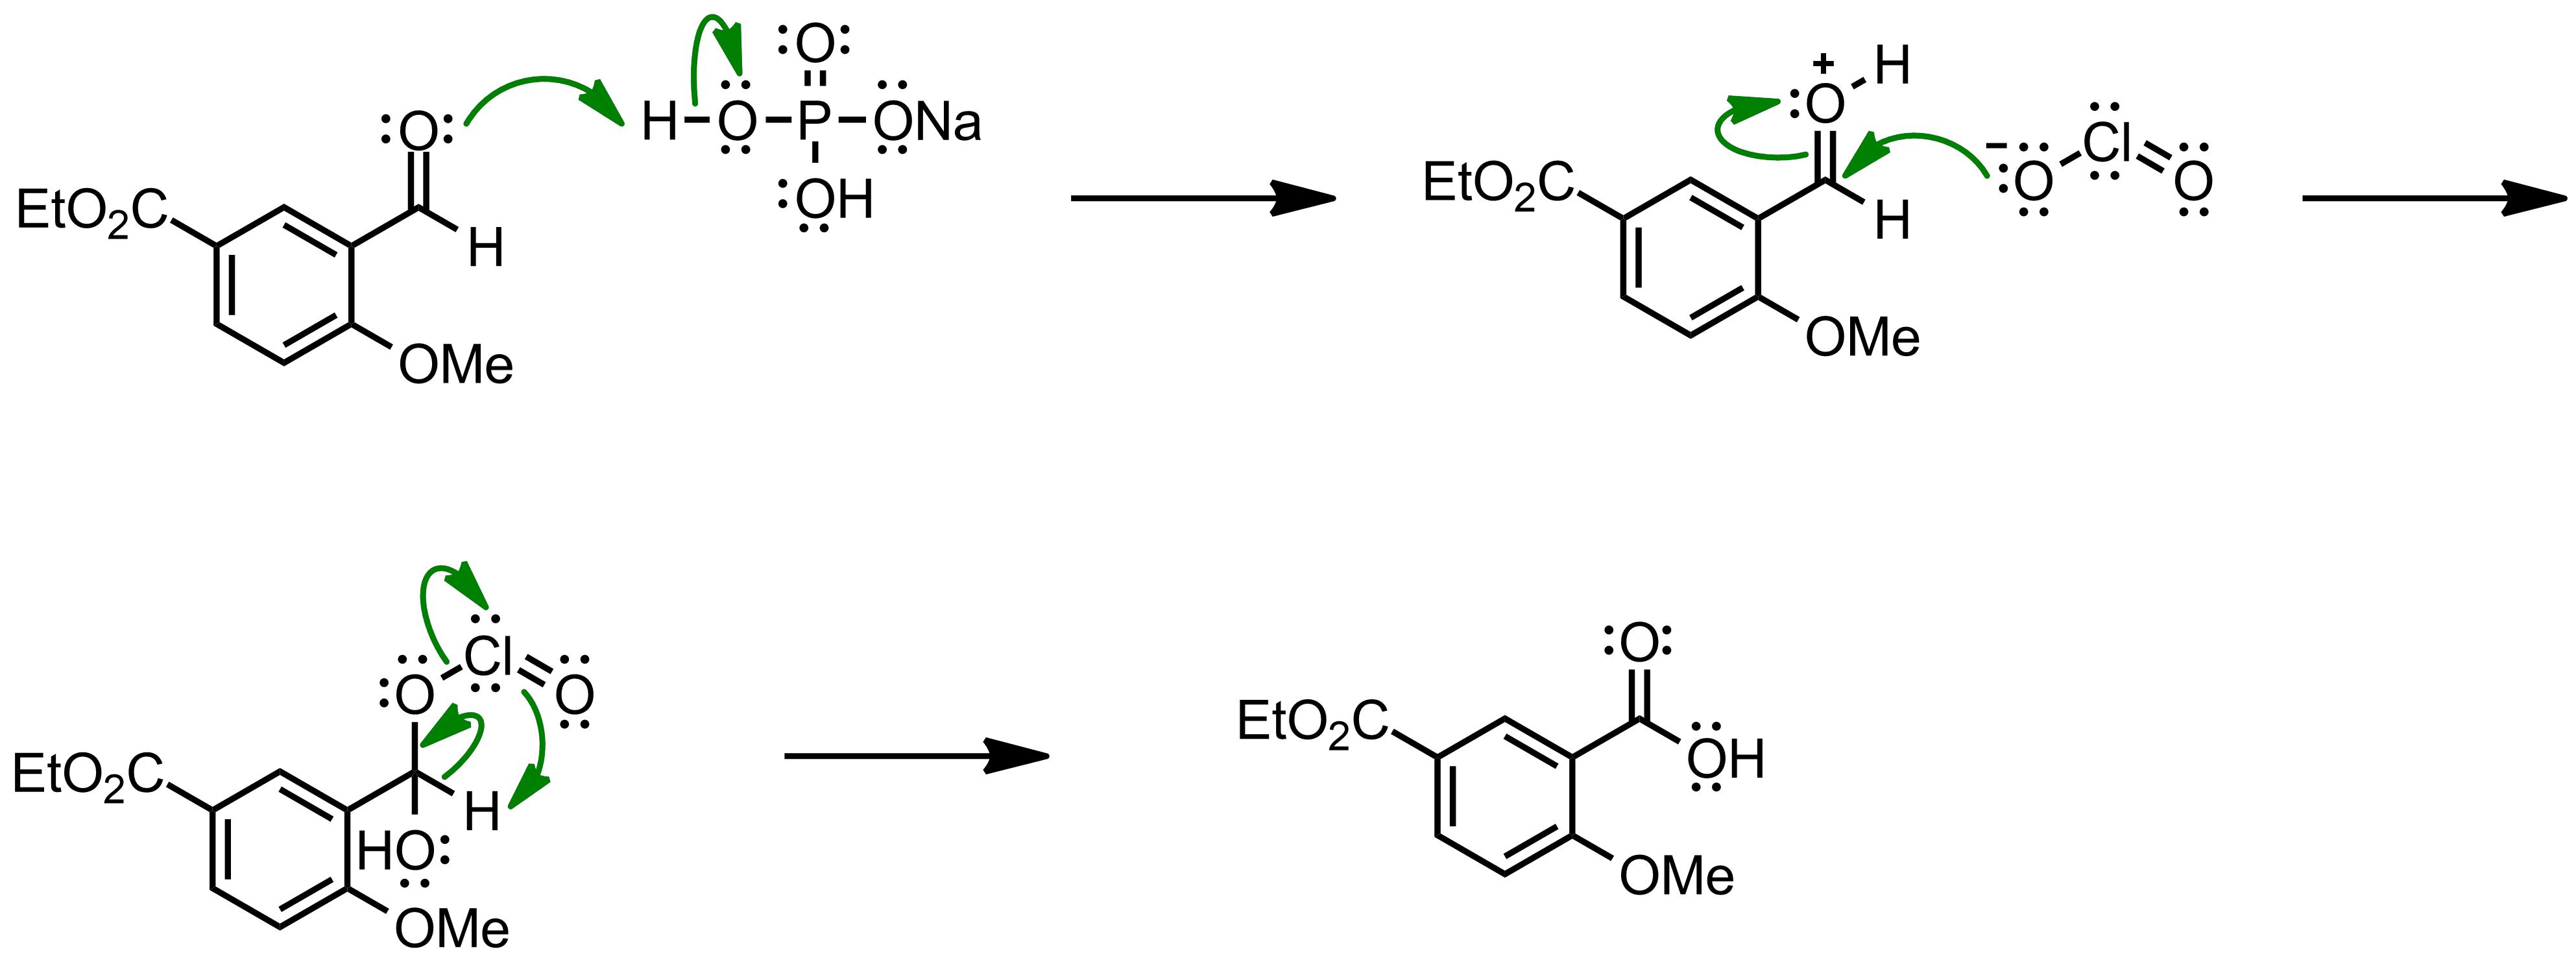 Mechanism of the Pinnick-Lindgren Oxidation